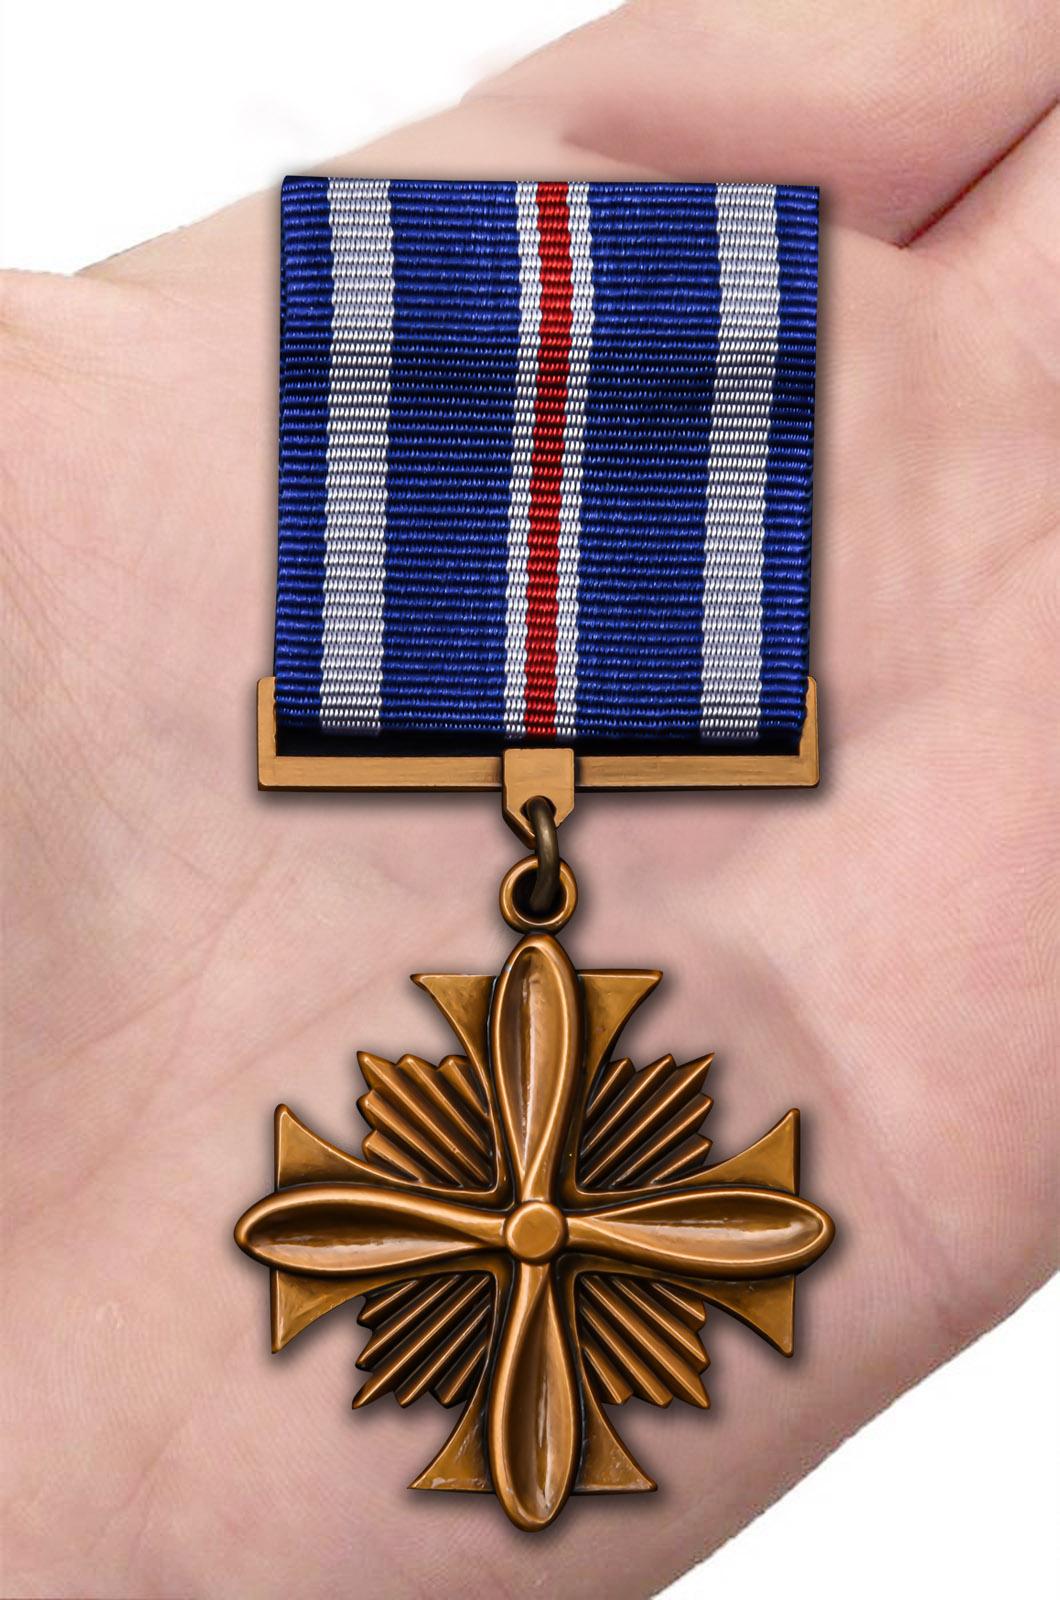 Заказать крест летных заслуг (США)